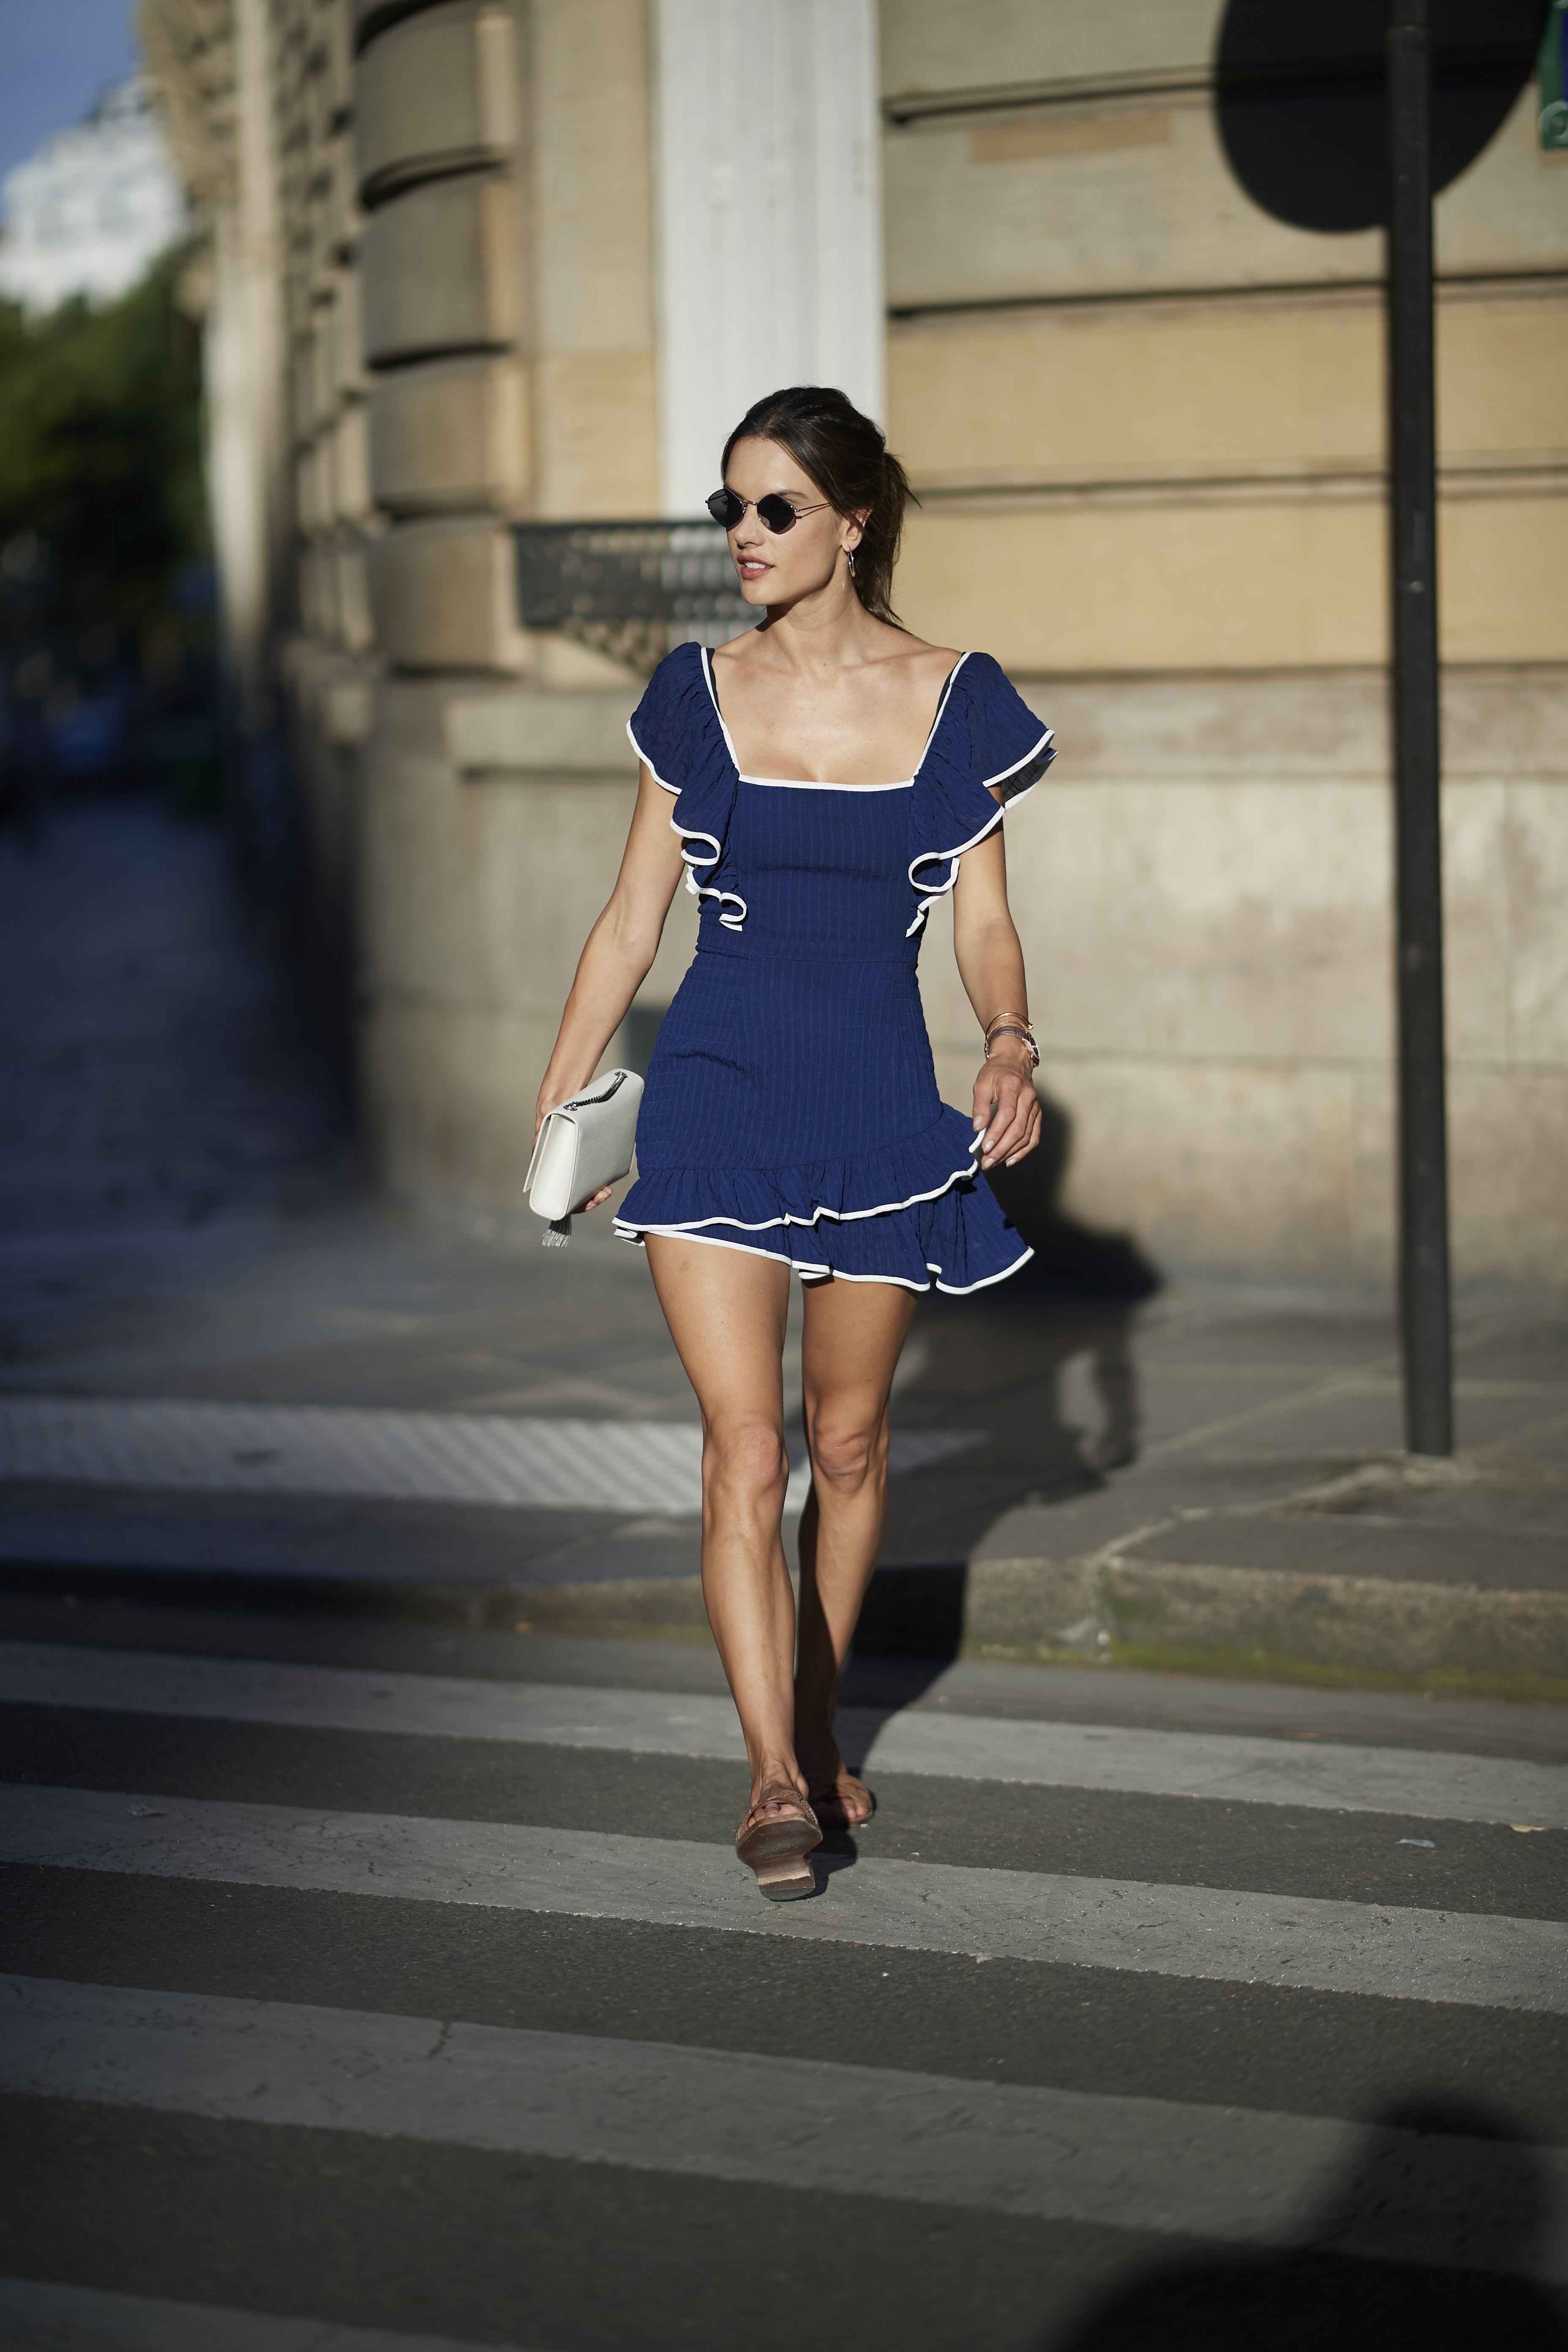 Victoria's Secret Models' Off-Duty Style